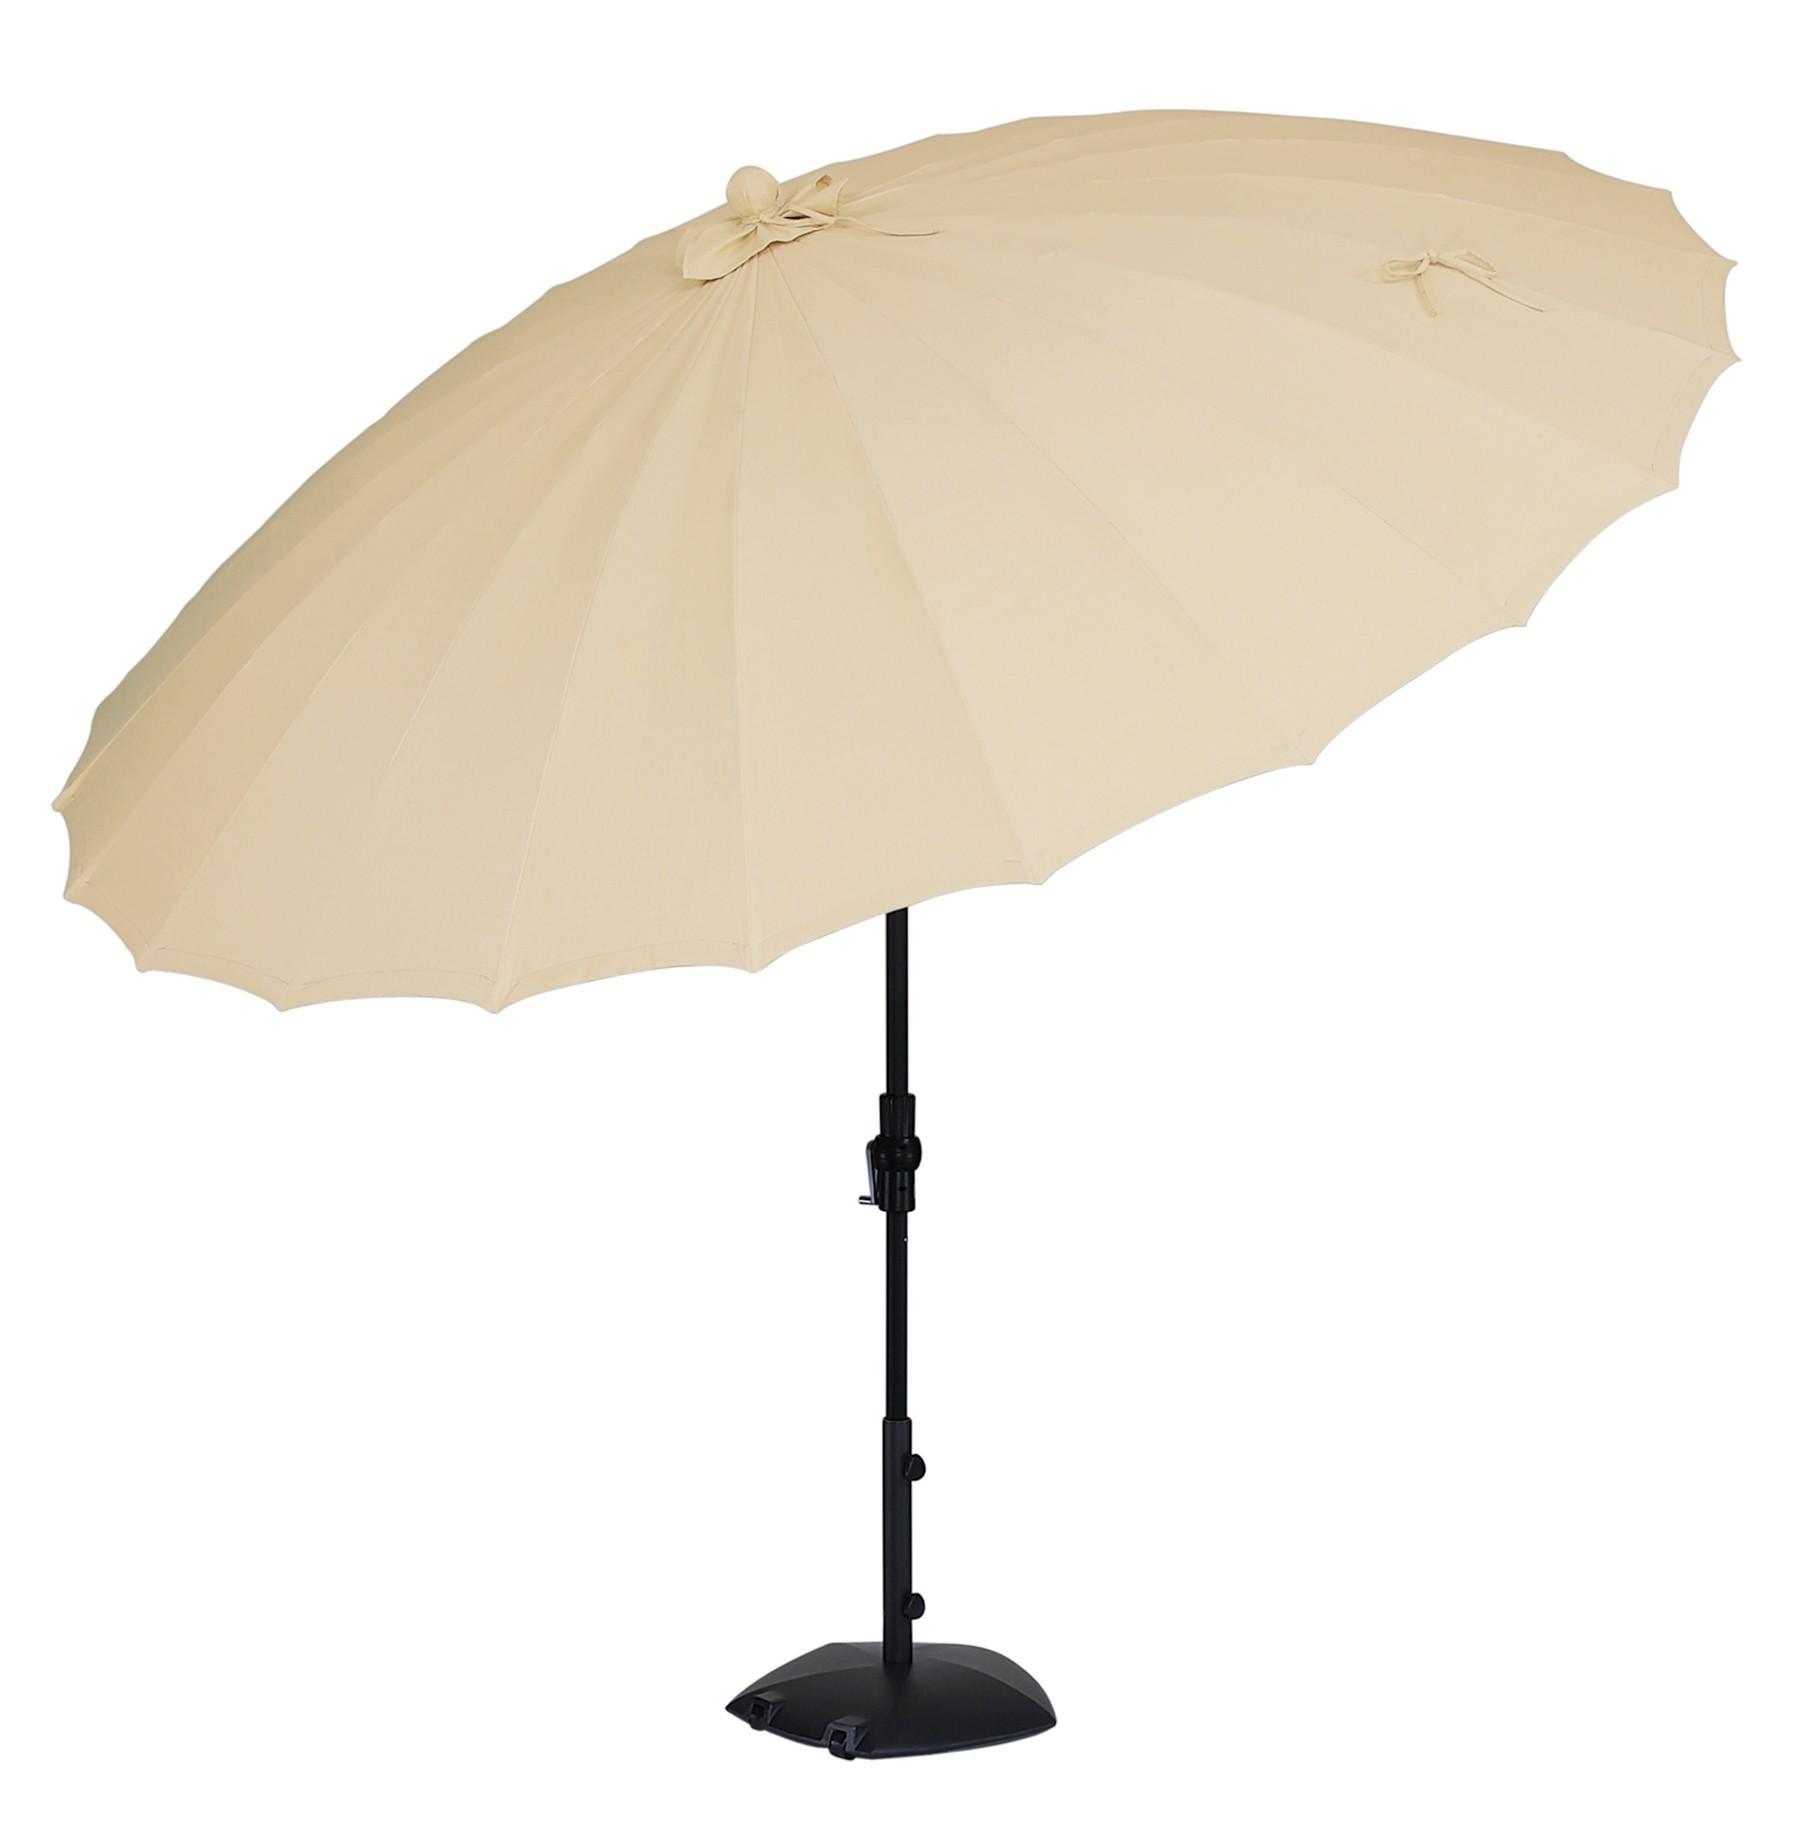 10u0026#39; Octagonal Shanghi Umbrella w/ Collar Tilt - Hauseru0026#39;s Patio